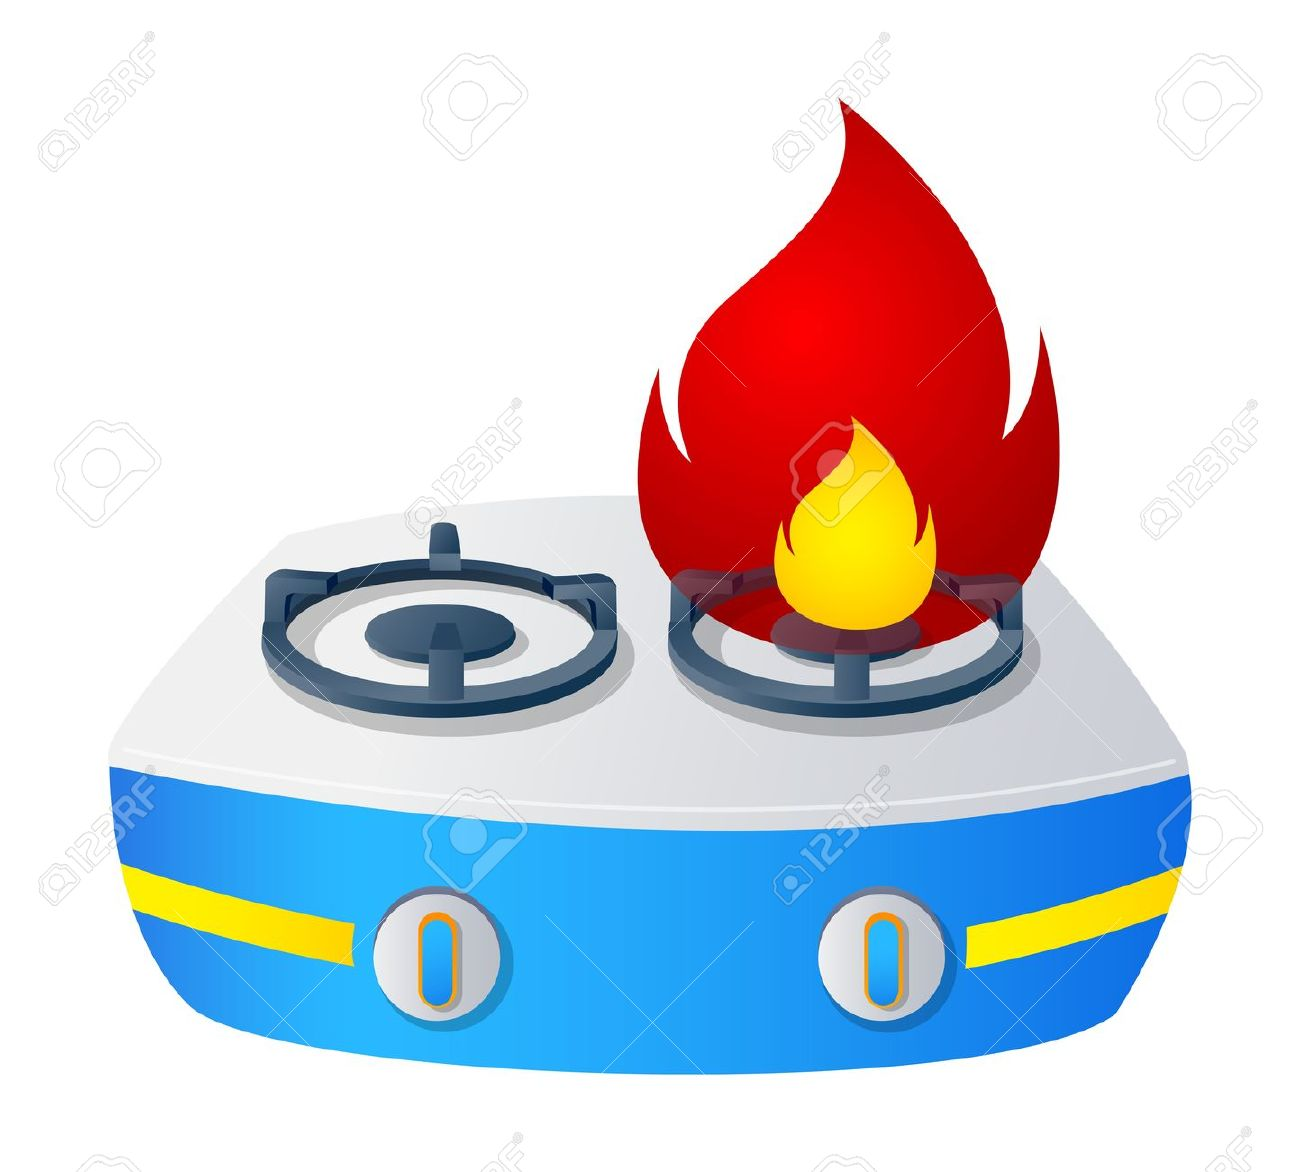 Gas Cooker clipart #5